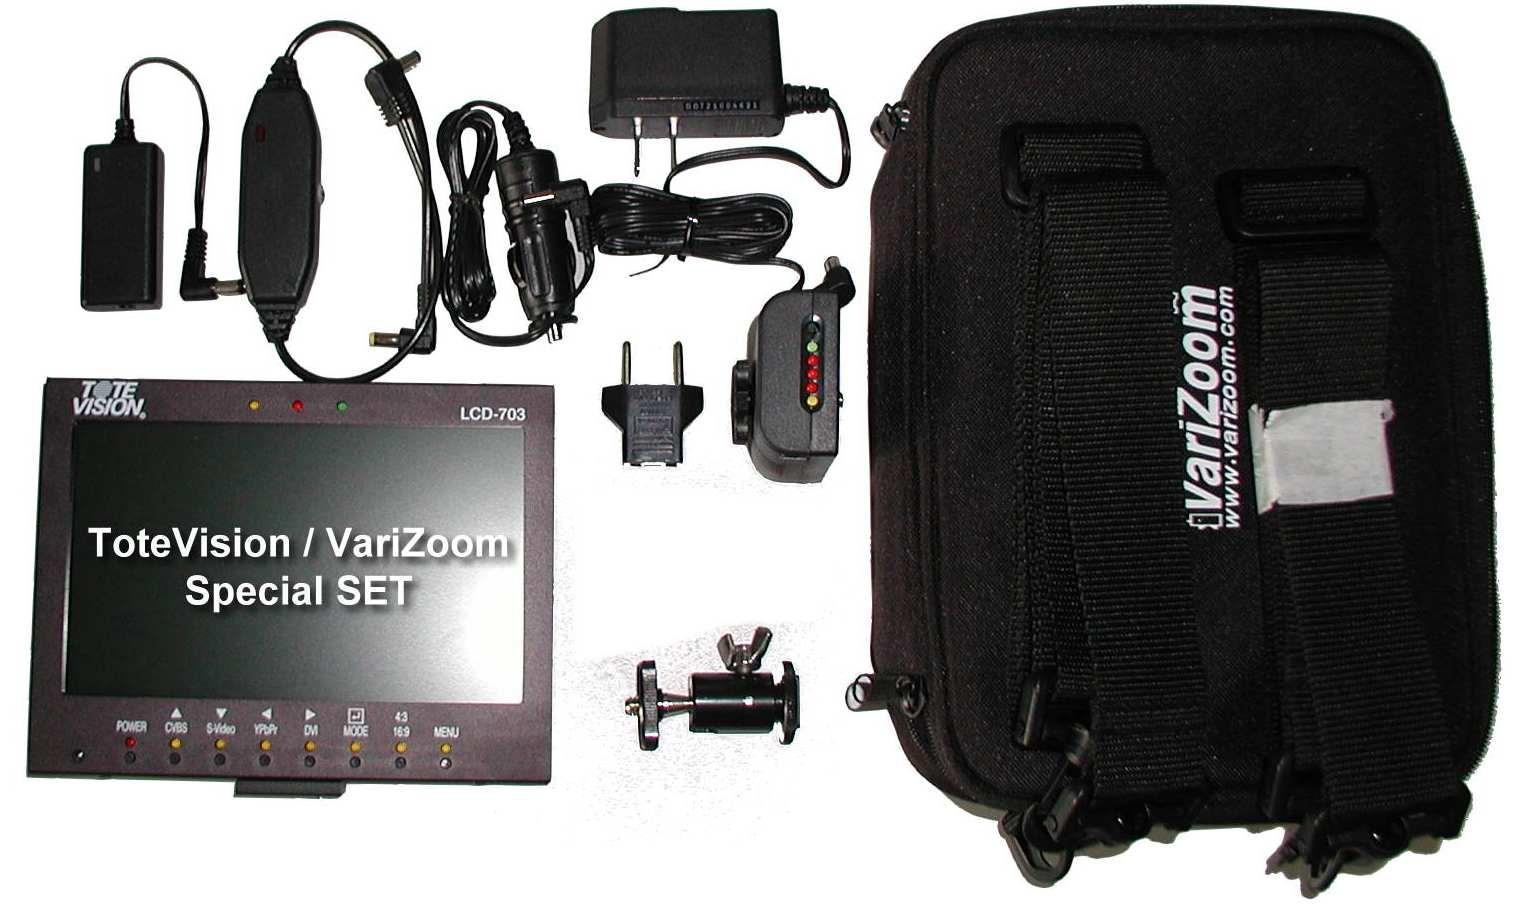 Foto ToteVision LCD-703 HD Set Monitor mit Akkusystem und Tasche